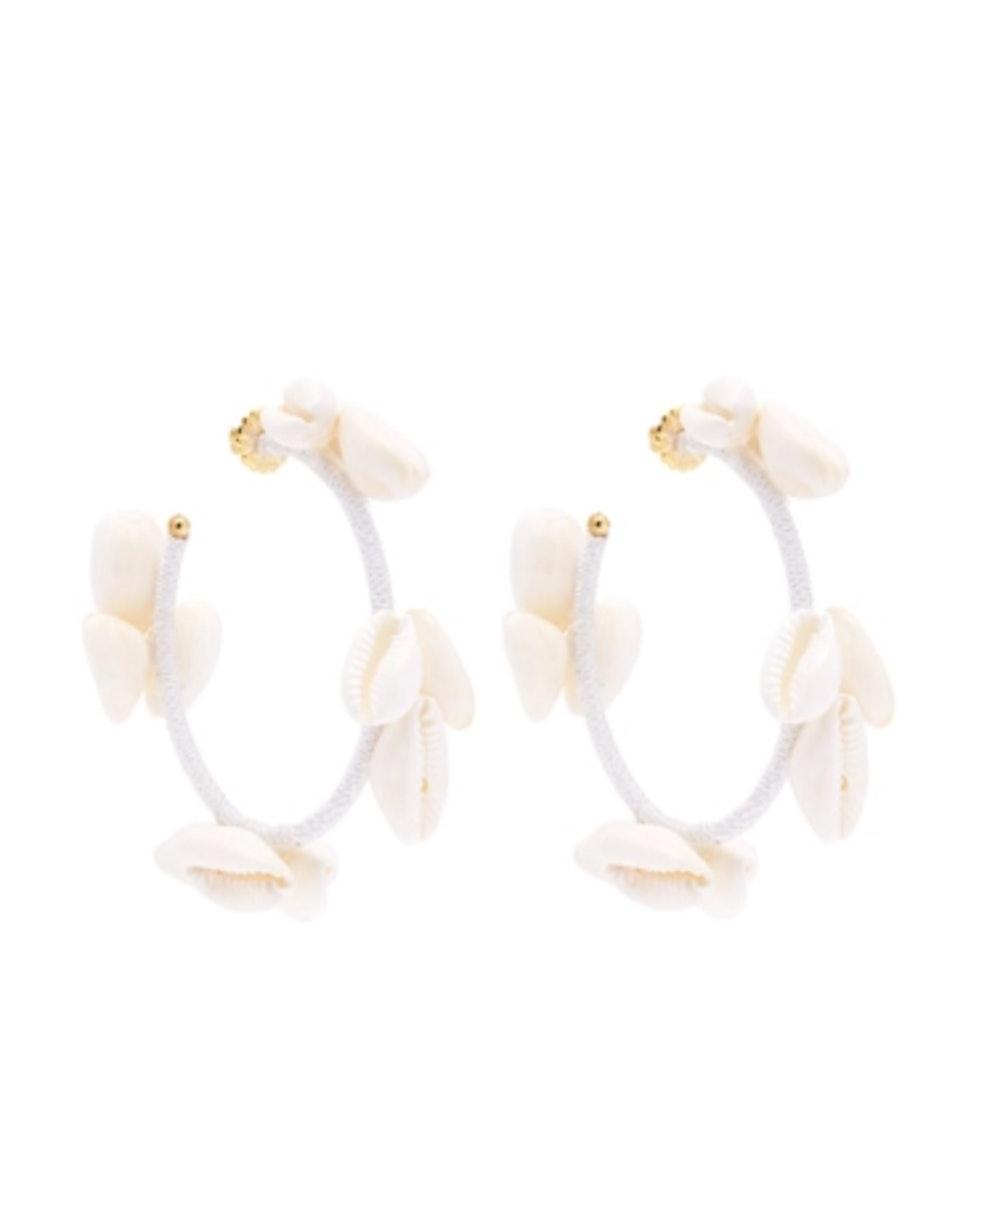 Olympia Shell-embellished Hoop Earring